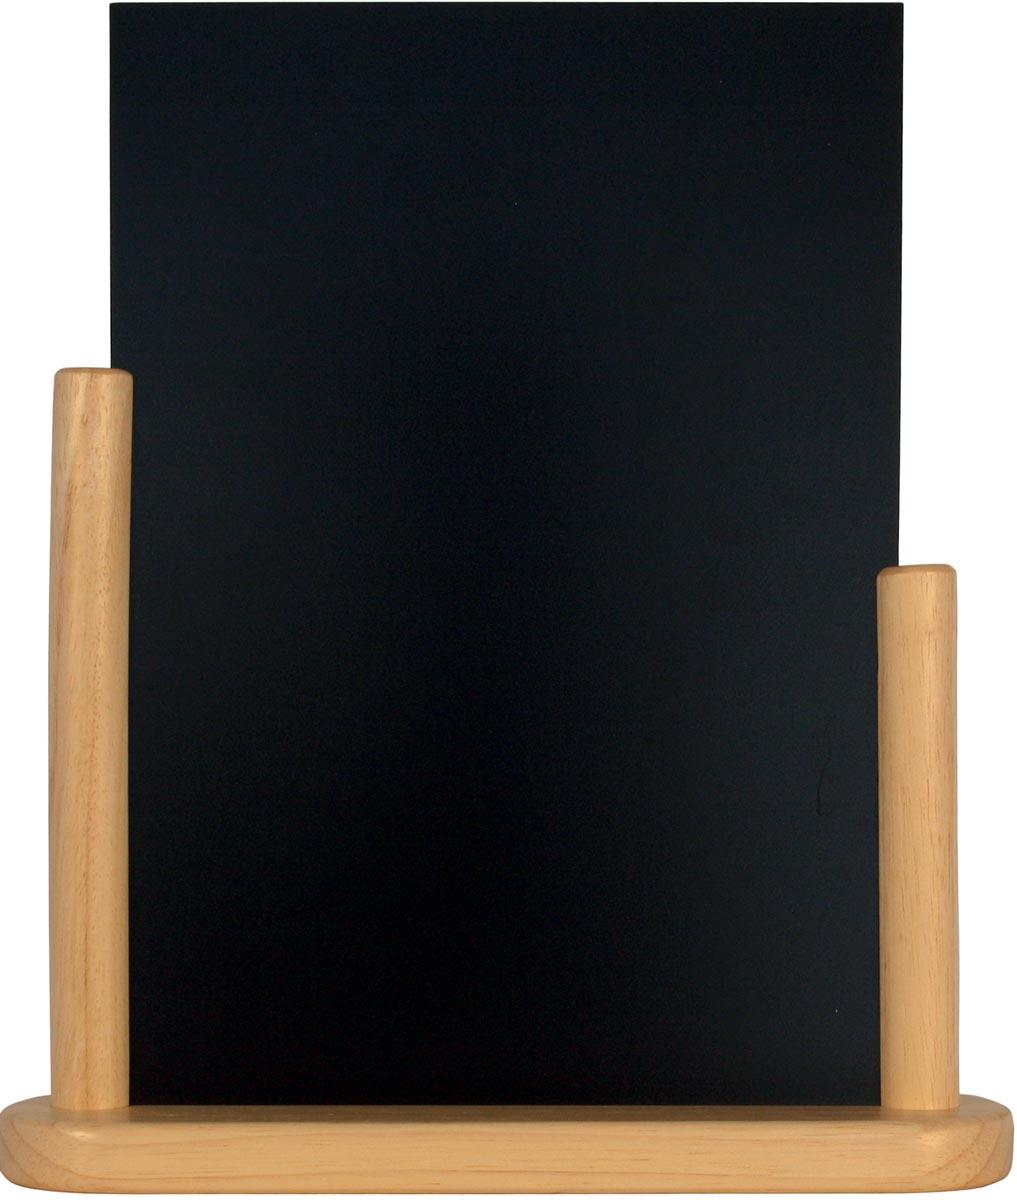 Securit tafelkrijtbord Elegant berk ft 32 x 28 cm